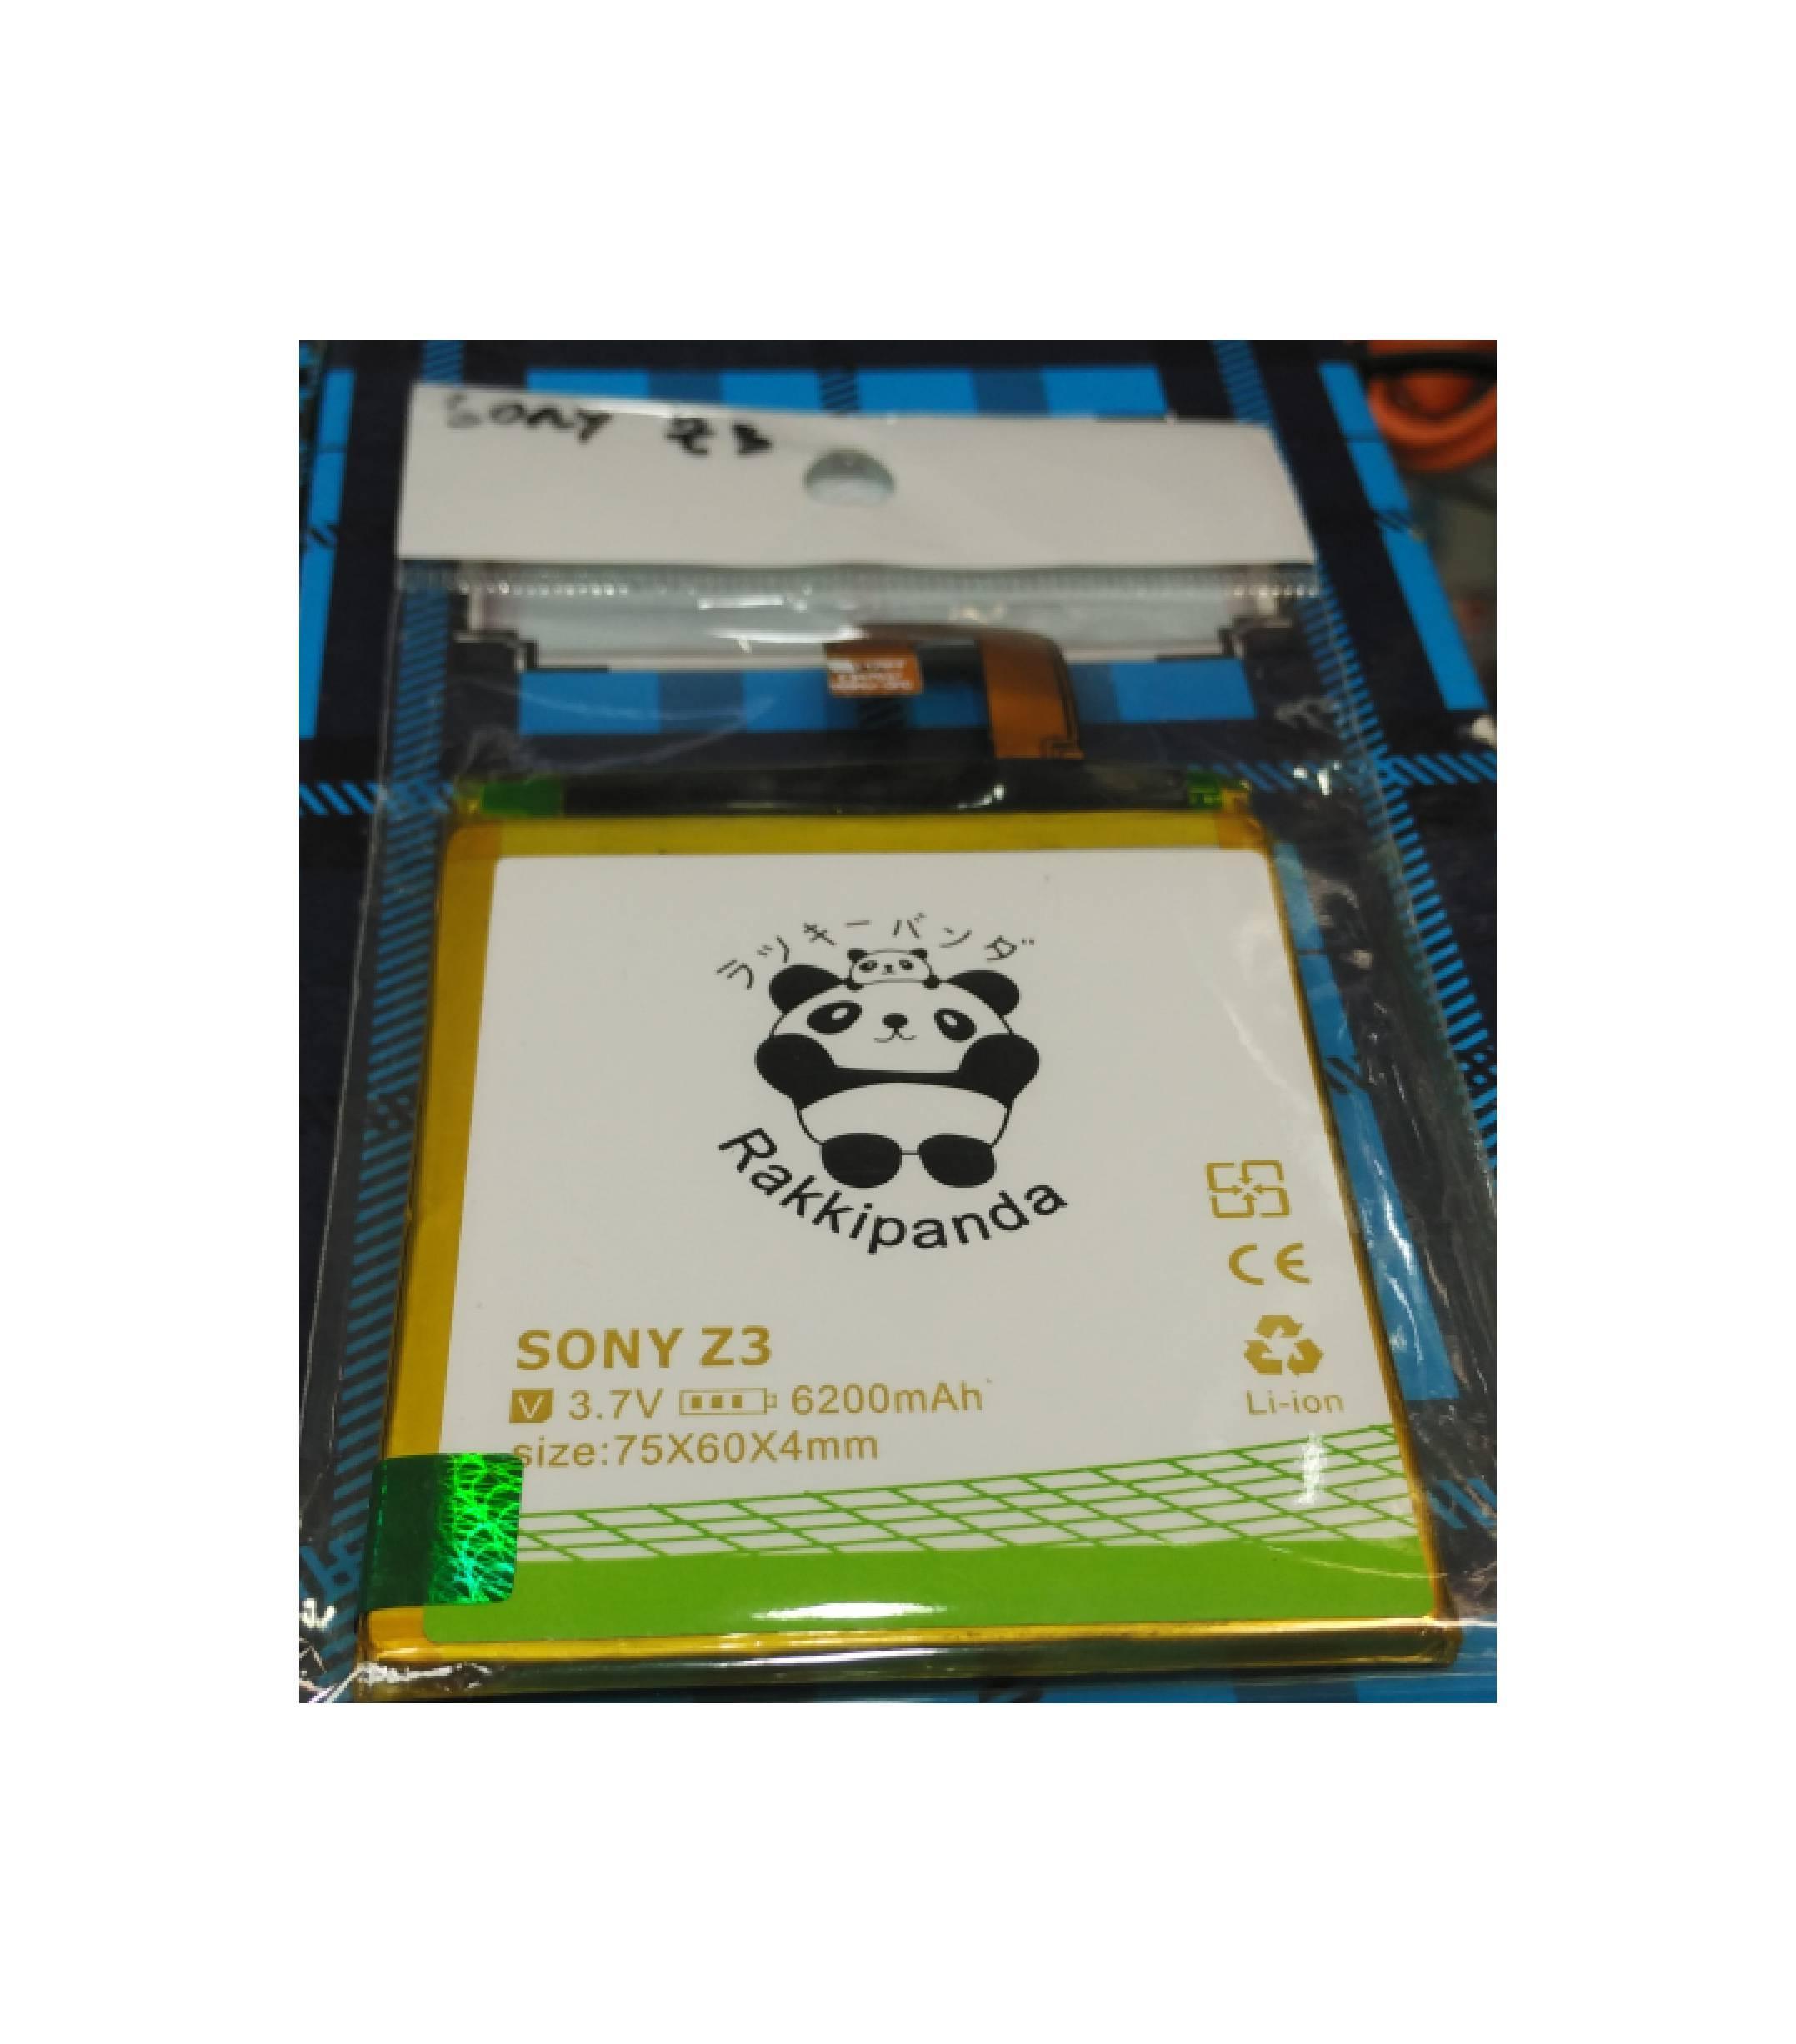 Cek Harga Baru Baterai Sony Xperia C3 T3 E3 D2533 Rakkipanda Double Back Cover Z3 Tutup Battre Batt L55 Lis1558erpc Power